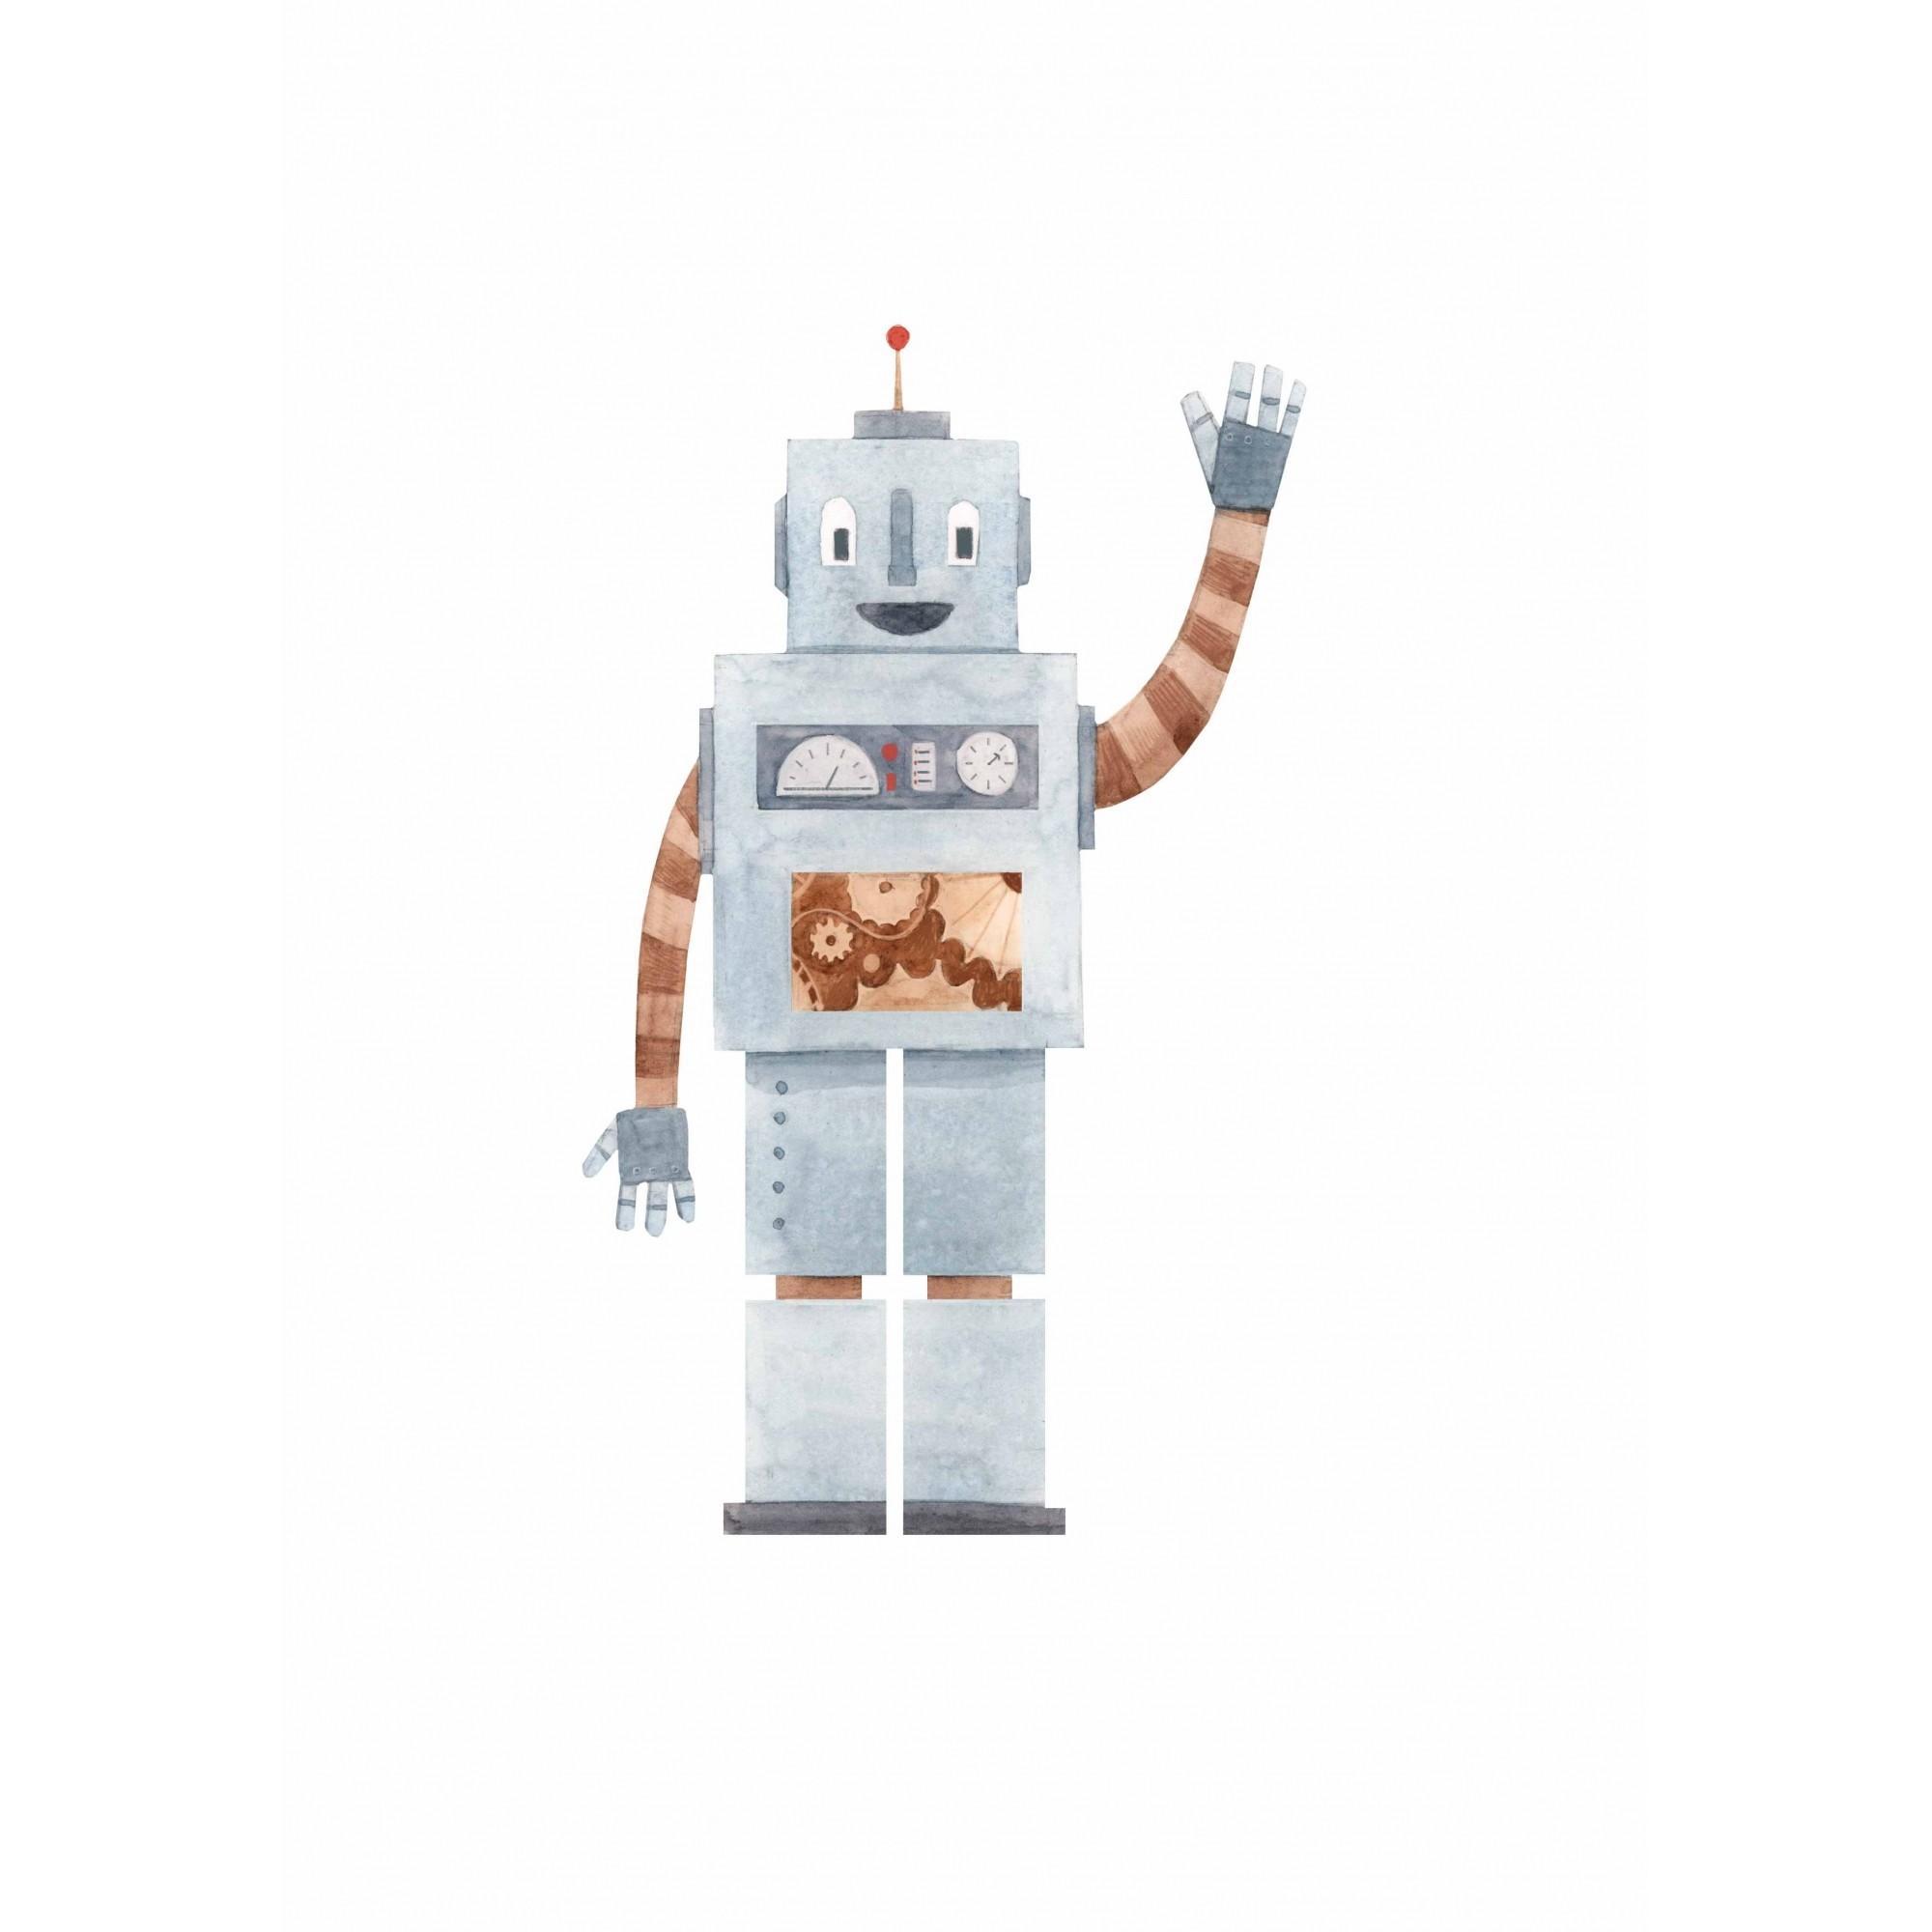 The Robot I